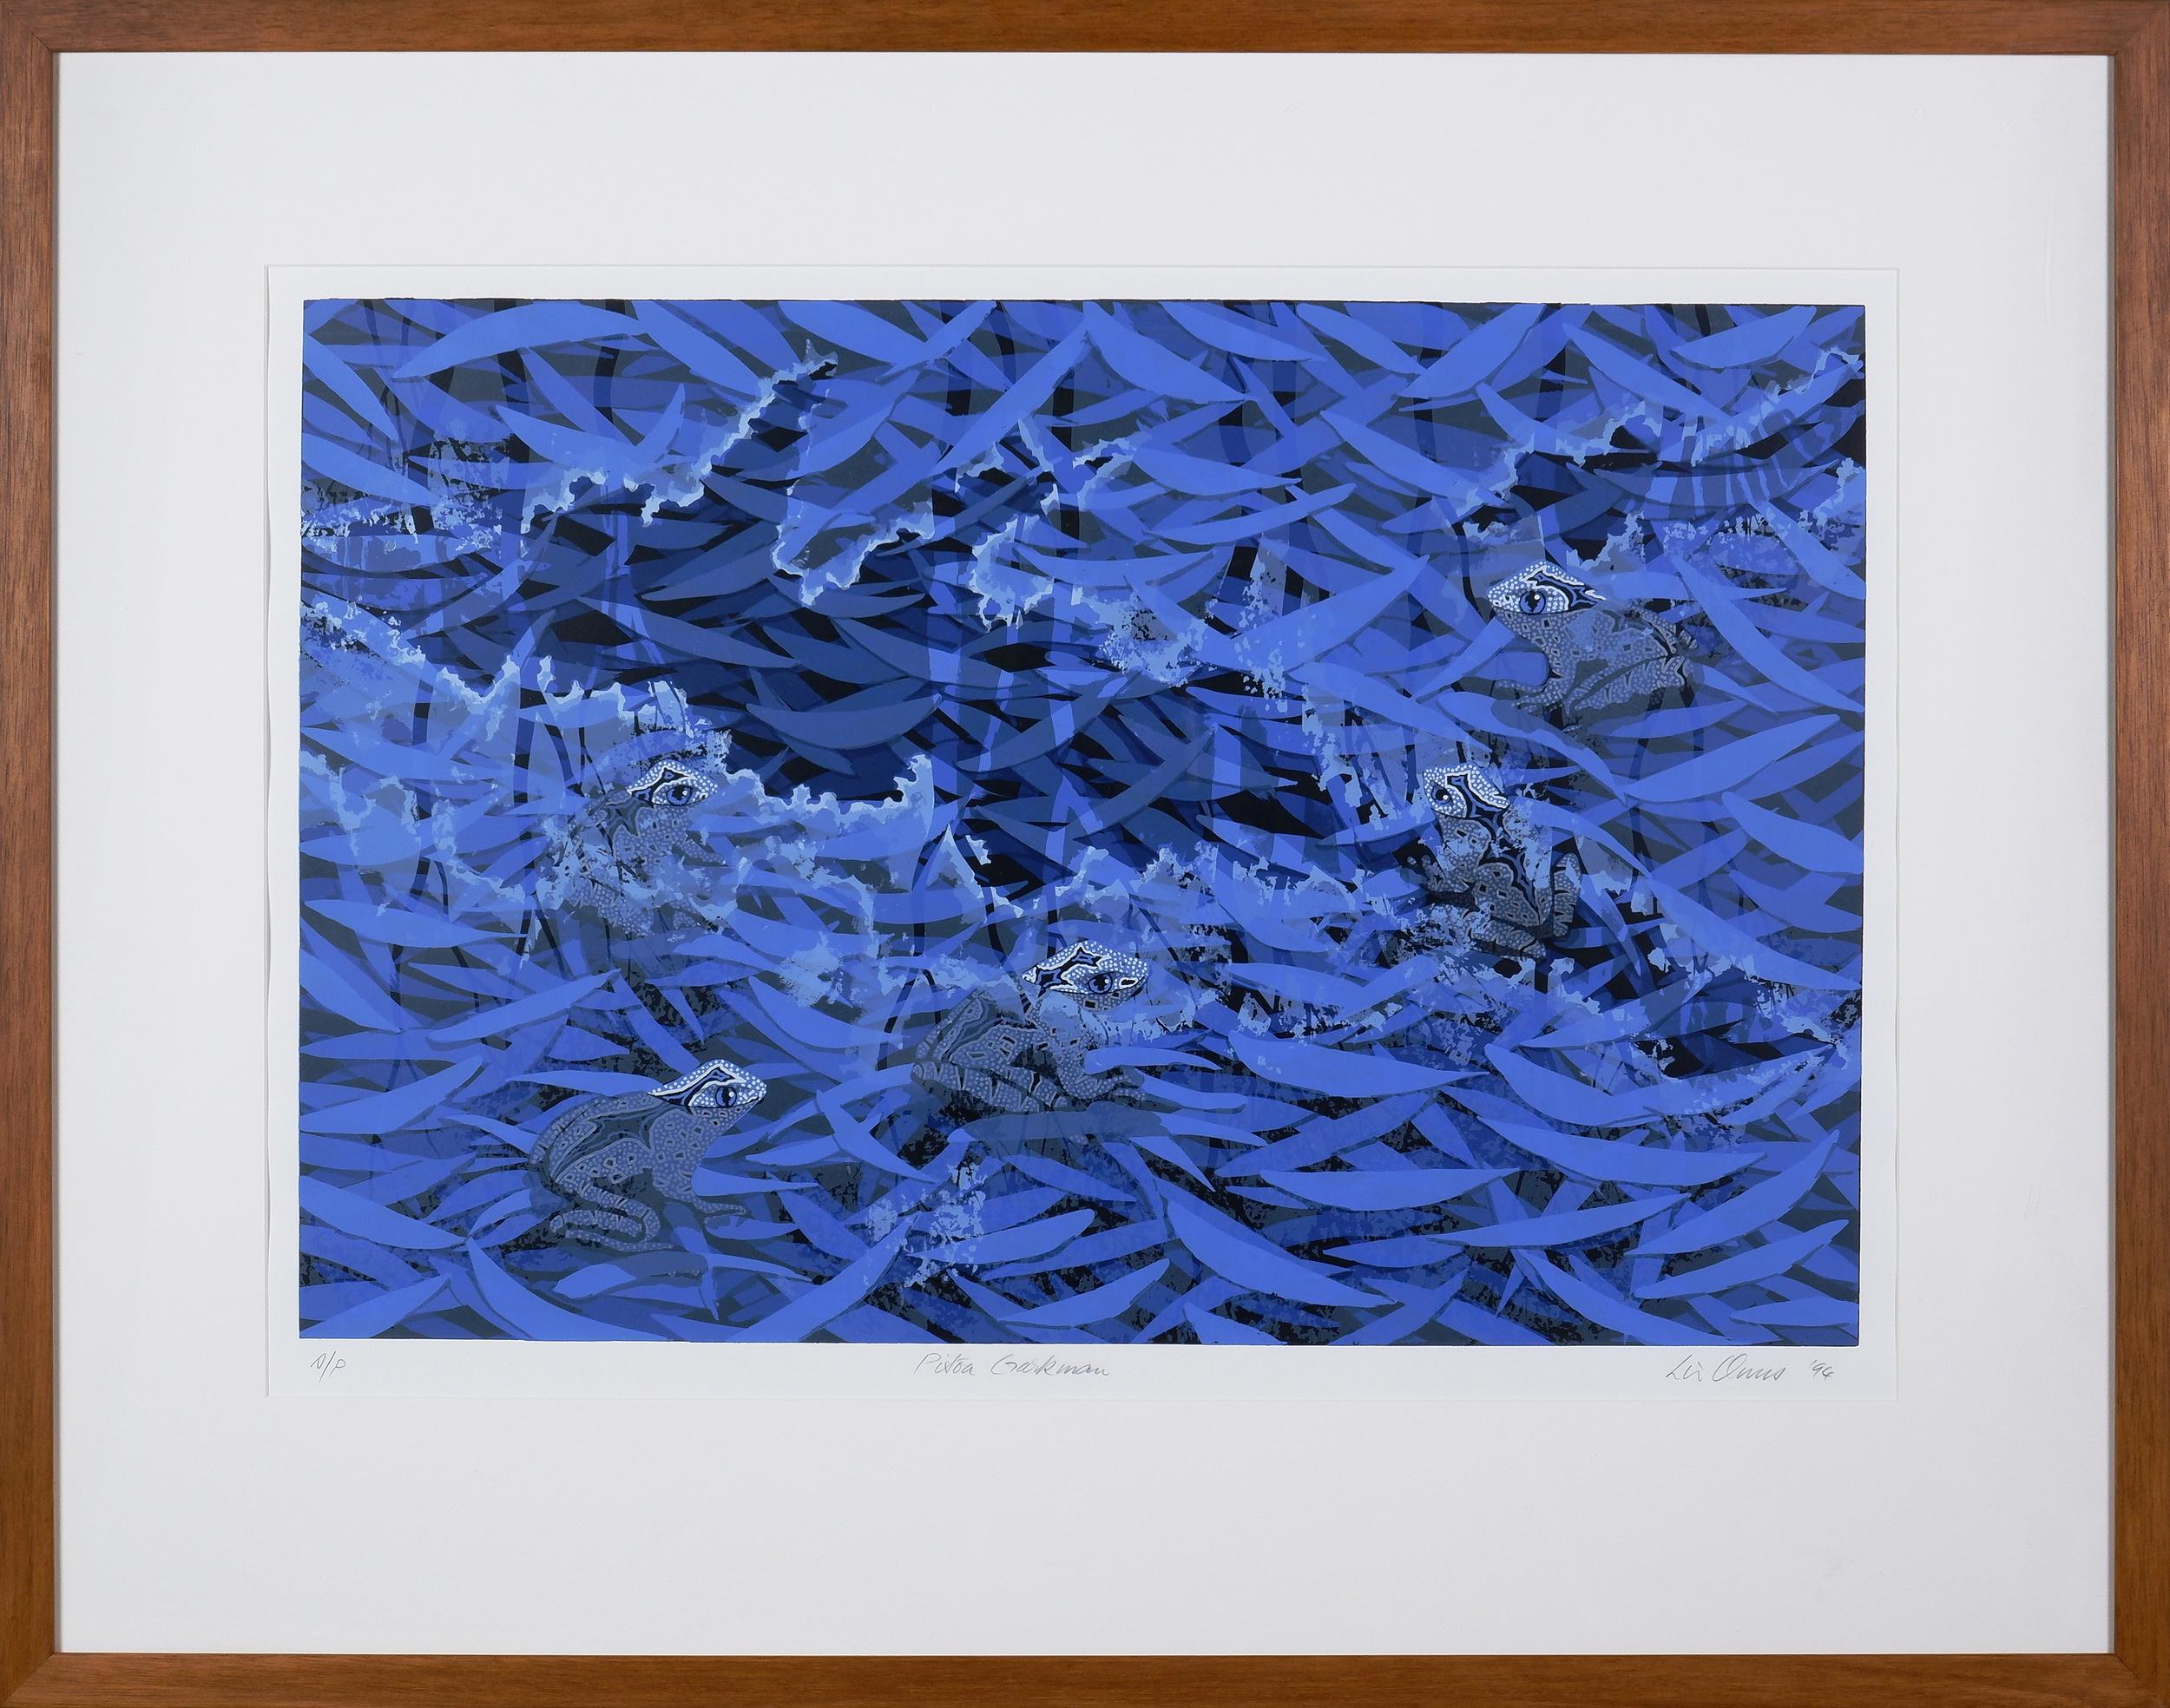 'Lin Onus (1948-1996 Yorta Yorta language group), Pitoa Garkman 1994, Screenprint A/P, 50 x 70 cm  '